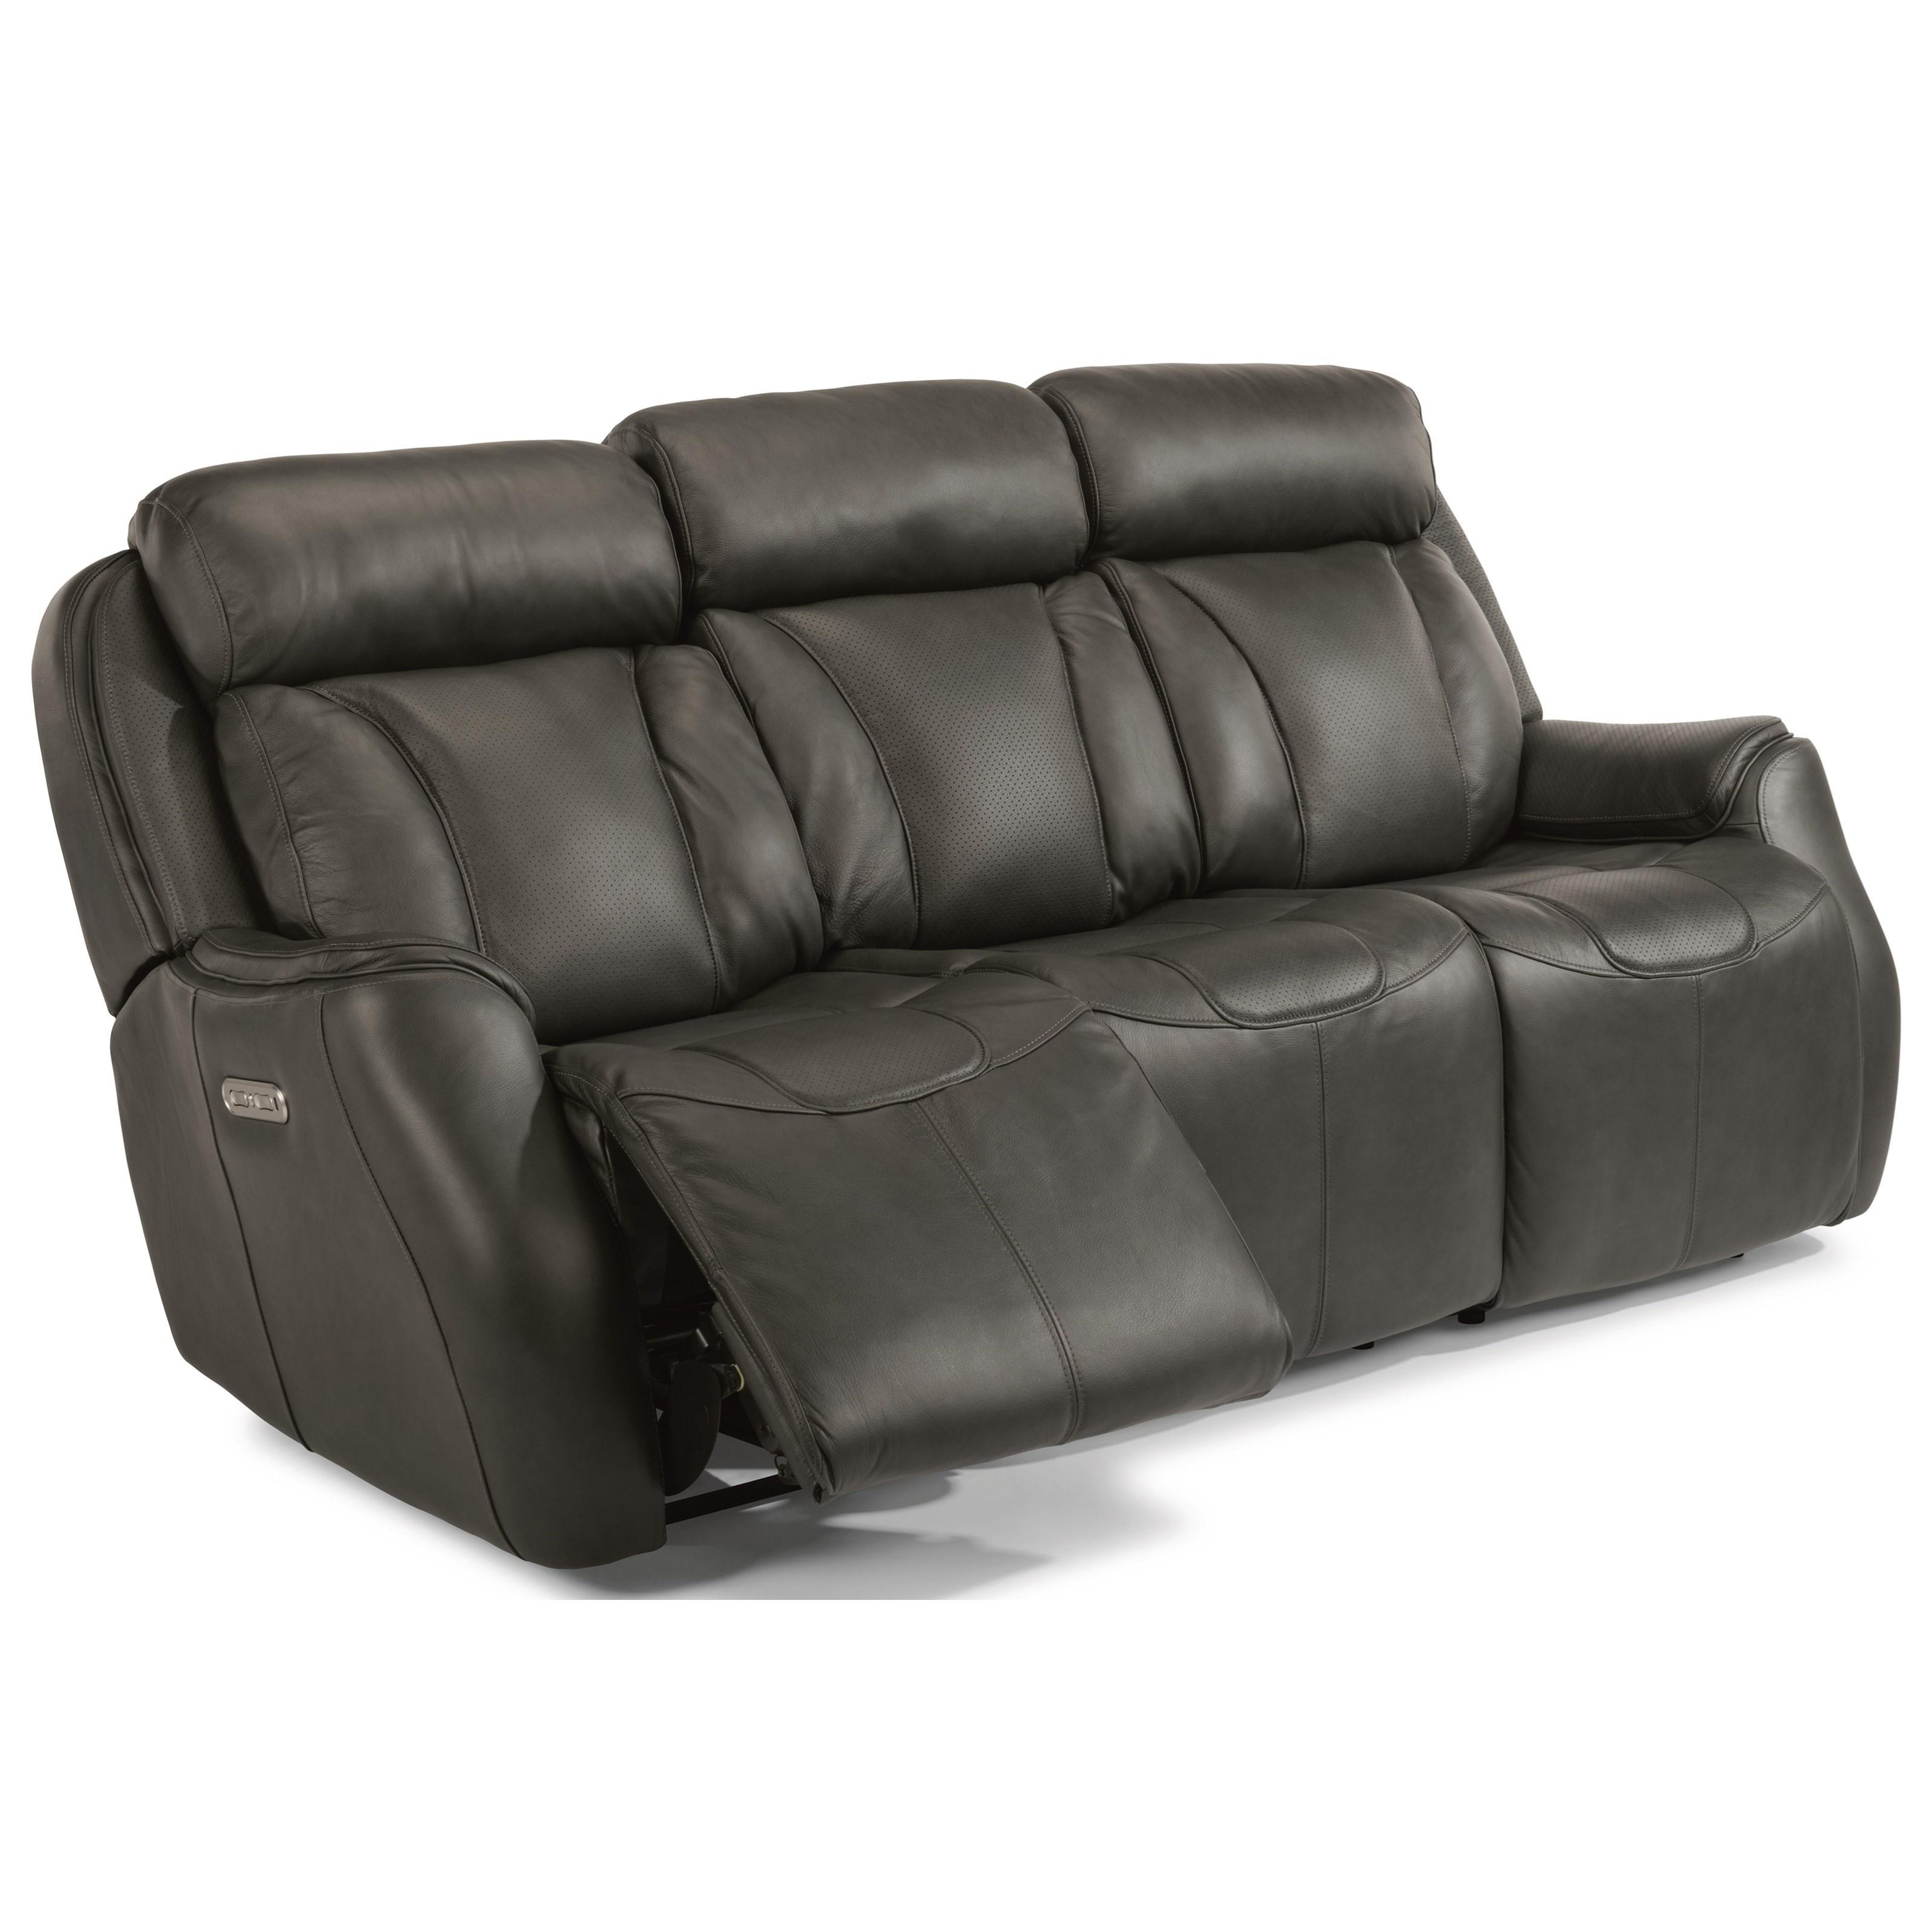 flexsteel reclining sofa warranty what makes a comfortable bed latitudes felix contemporary power